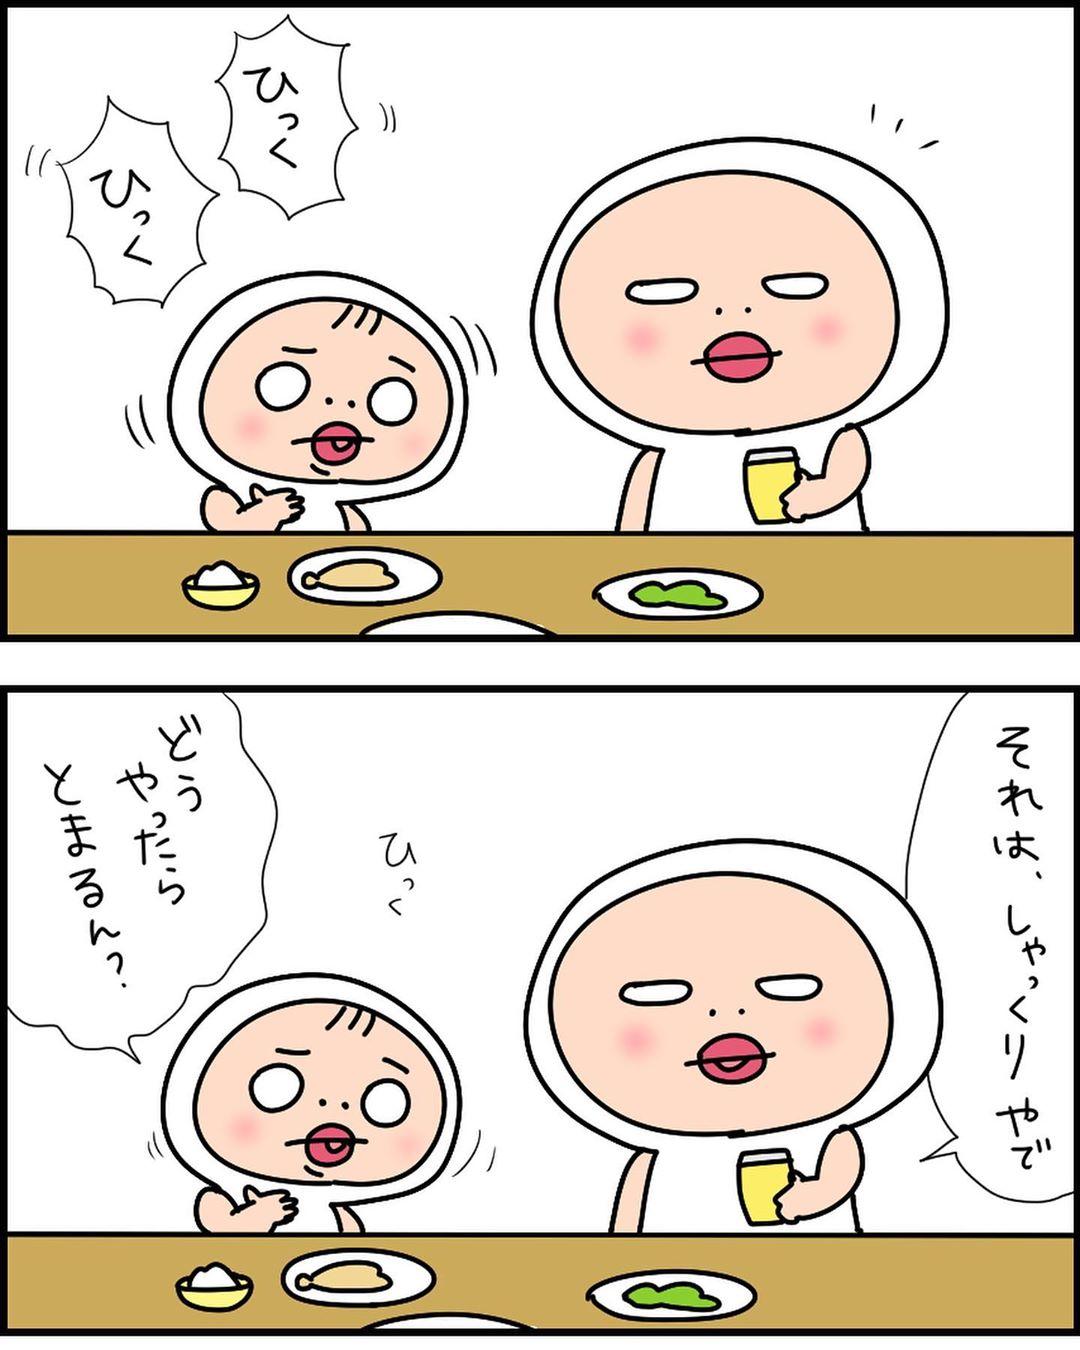 nikunohi029_65459678_380313699284347_2594014940935556946_n